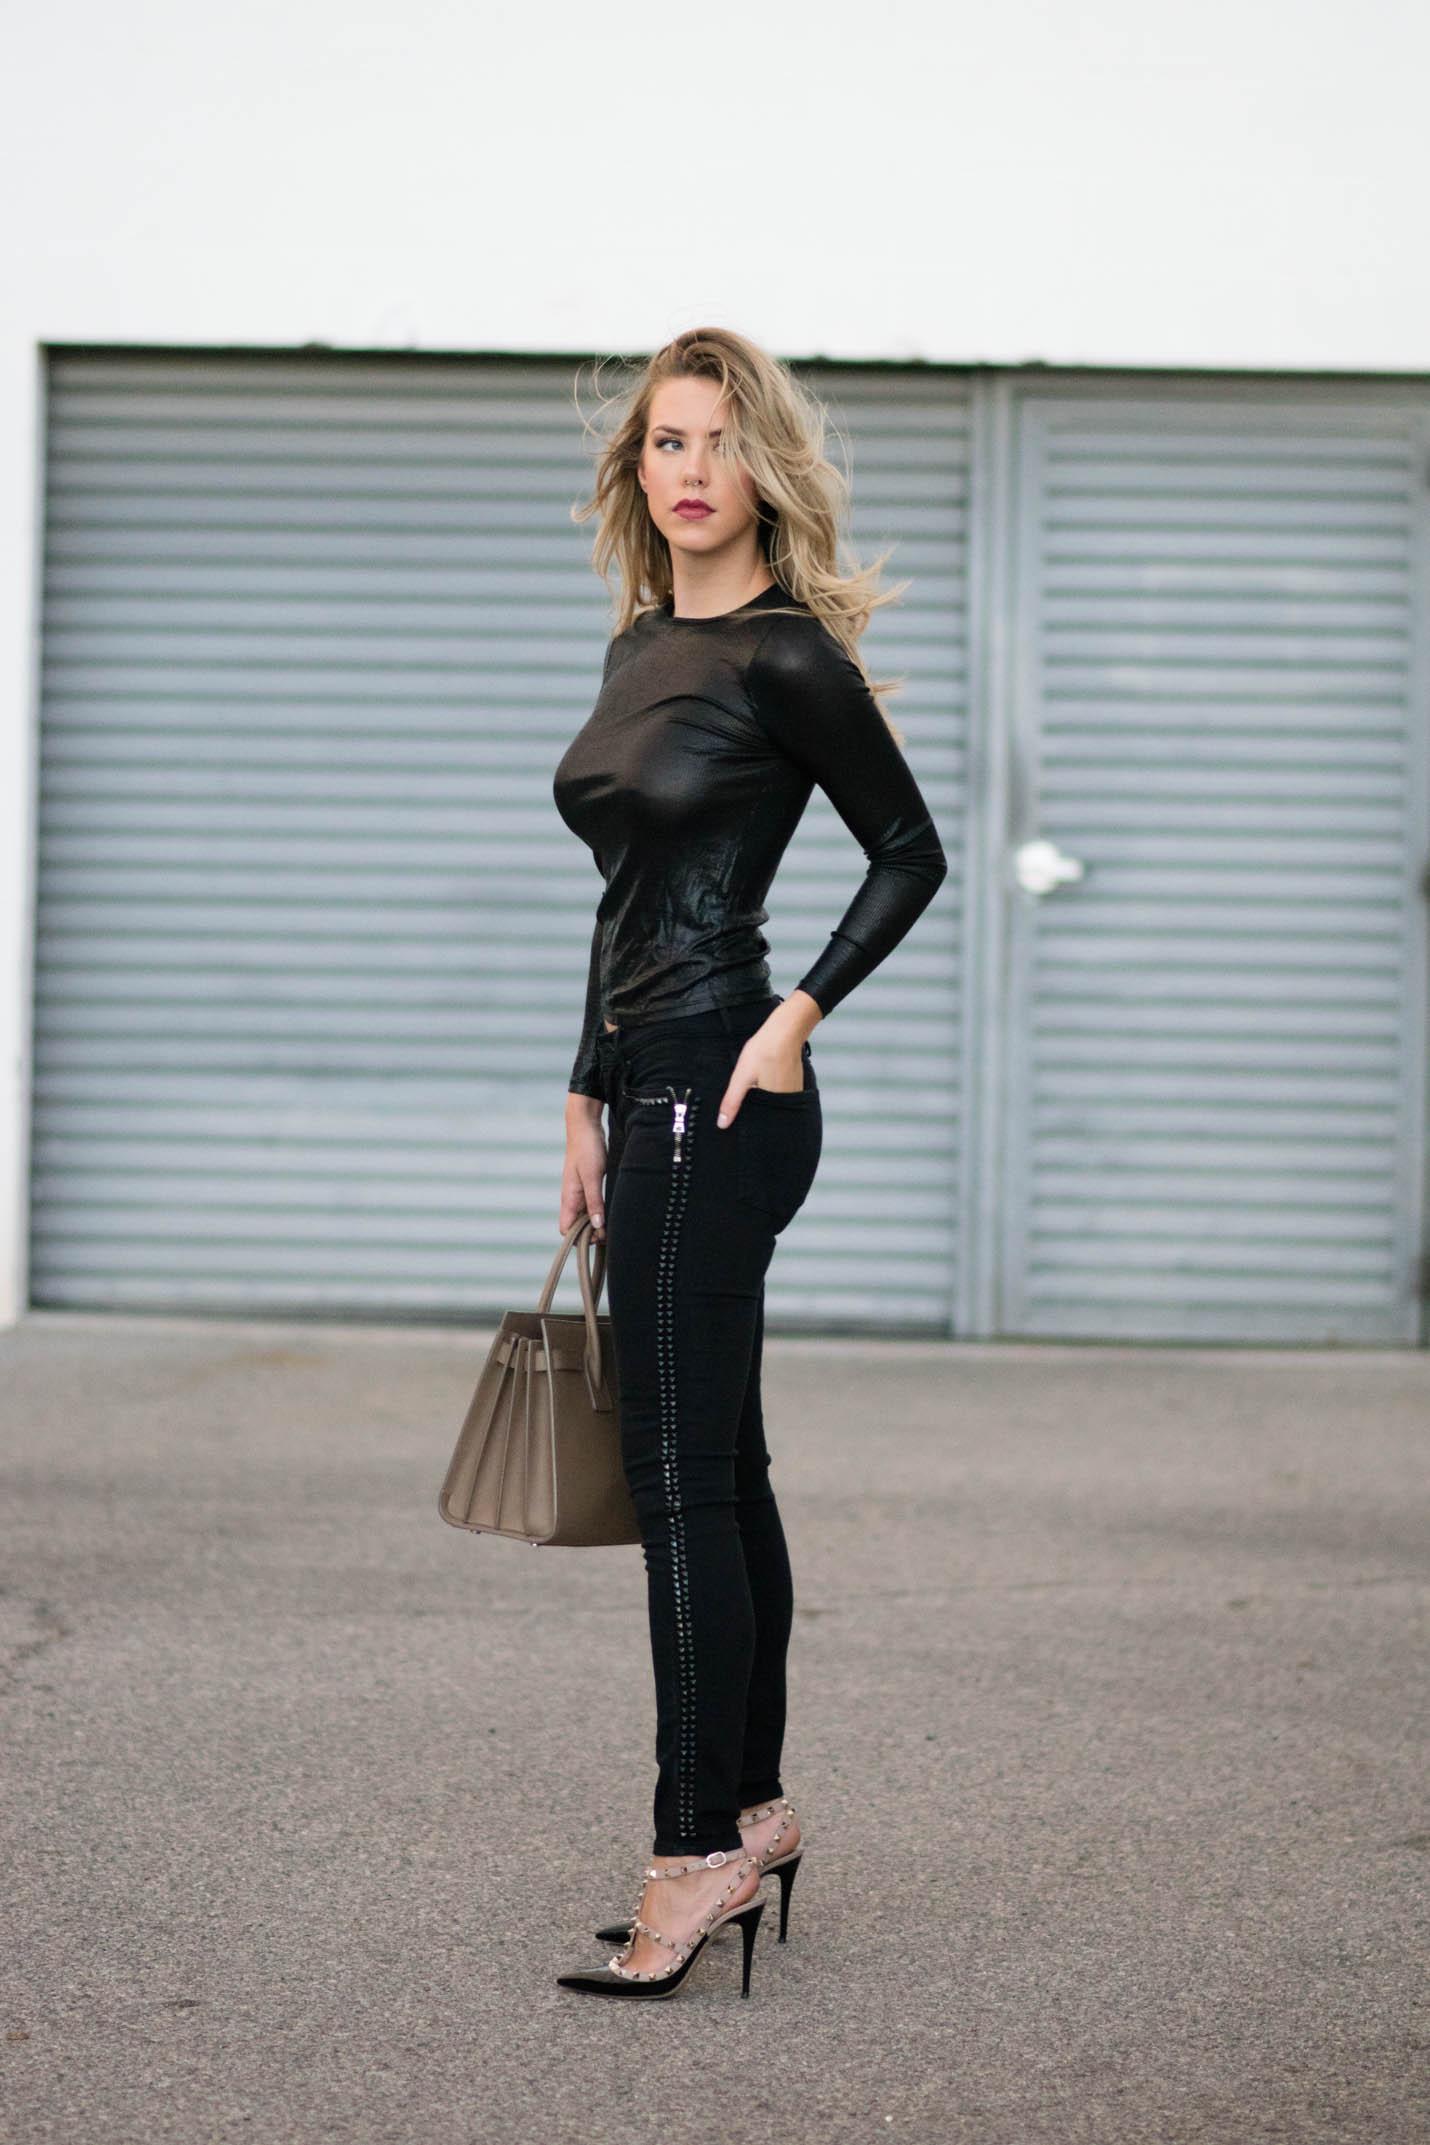 valentino rockstud pumps black/blush